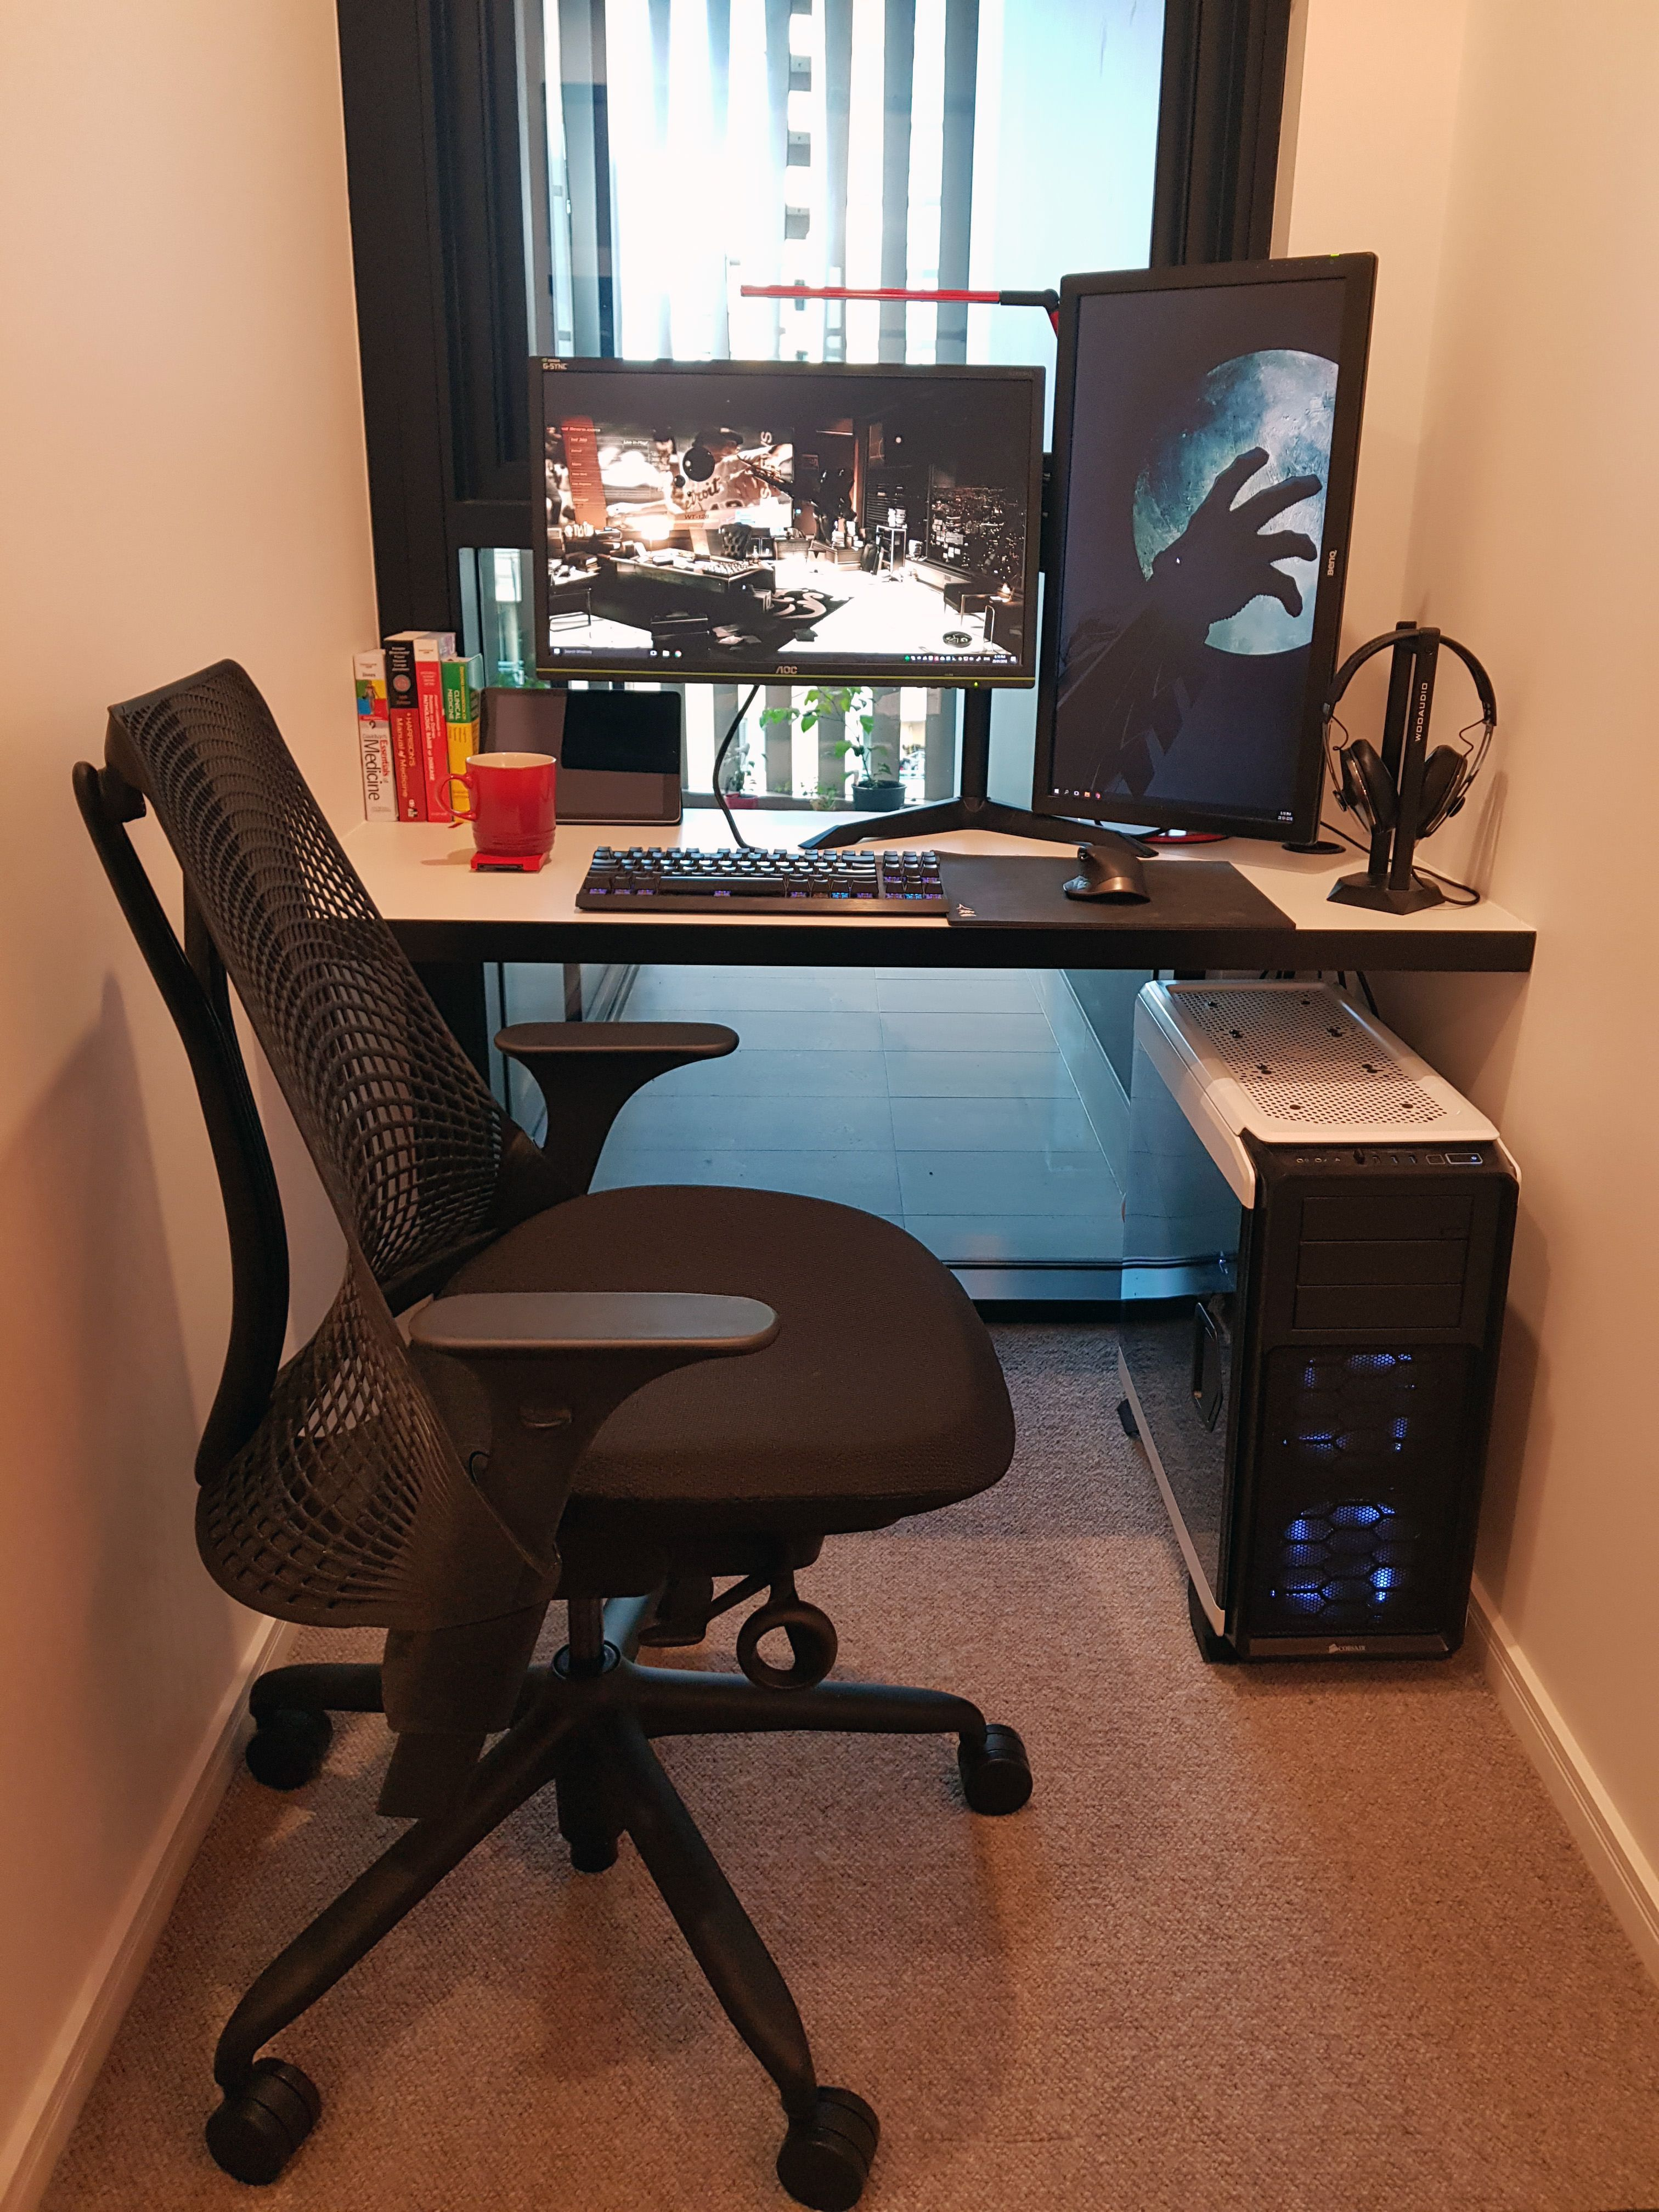 My Personal Gaming Setup Officegamespot Officegameprizes Gameheadoffice Gameheadofficecontactnumber Game Home Office Setup Computer Desk Diy Computer Desk